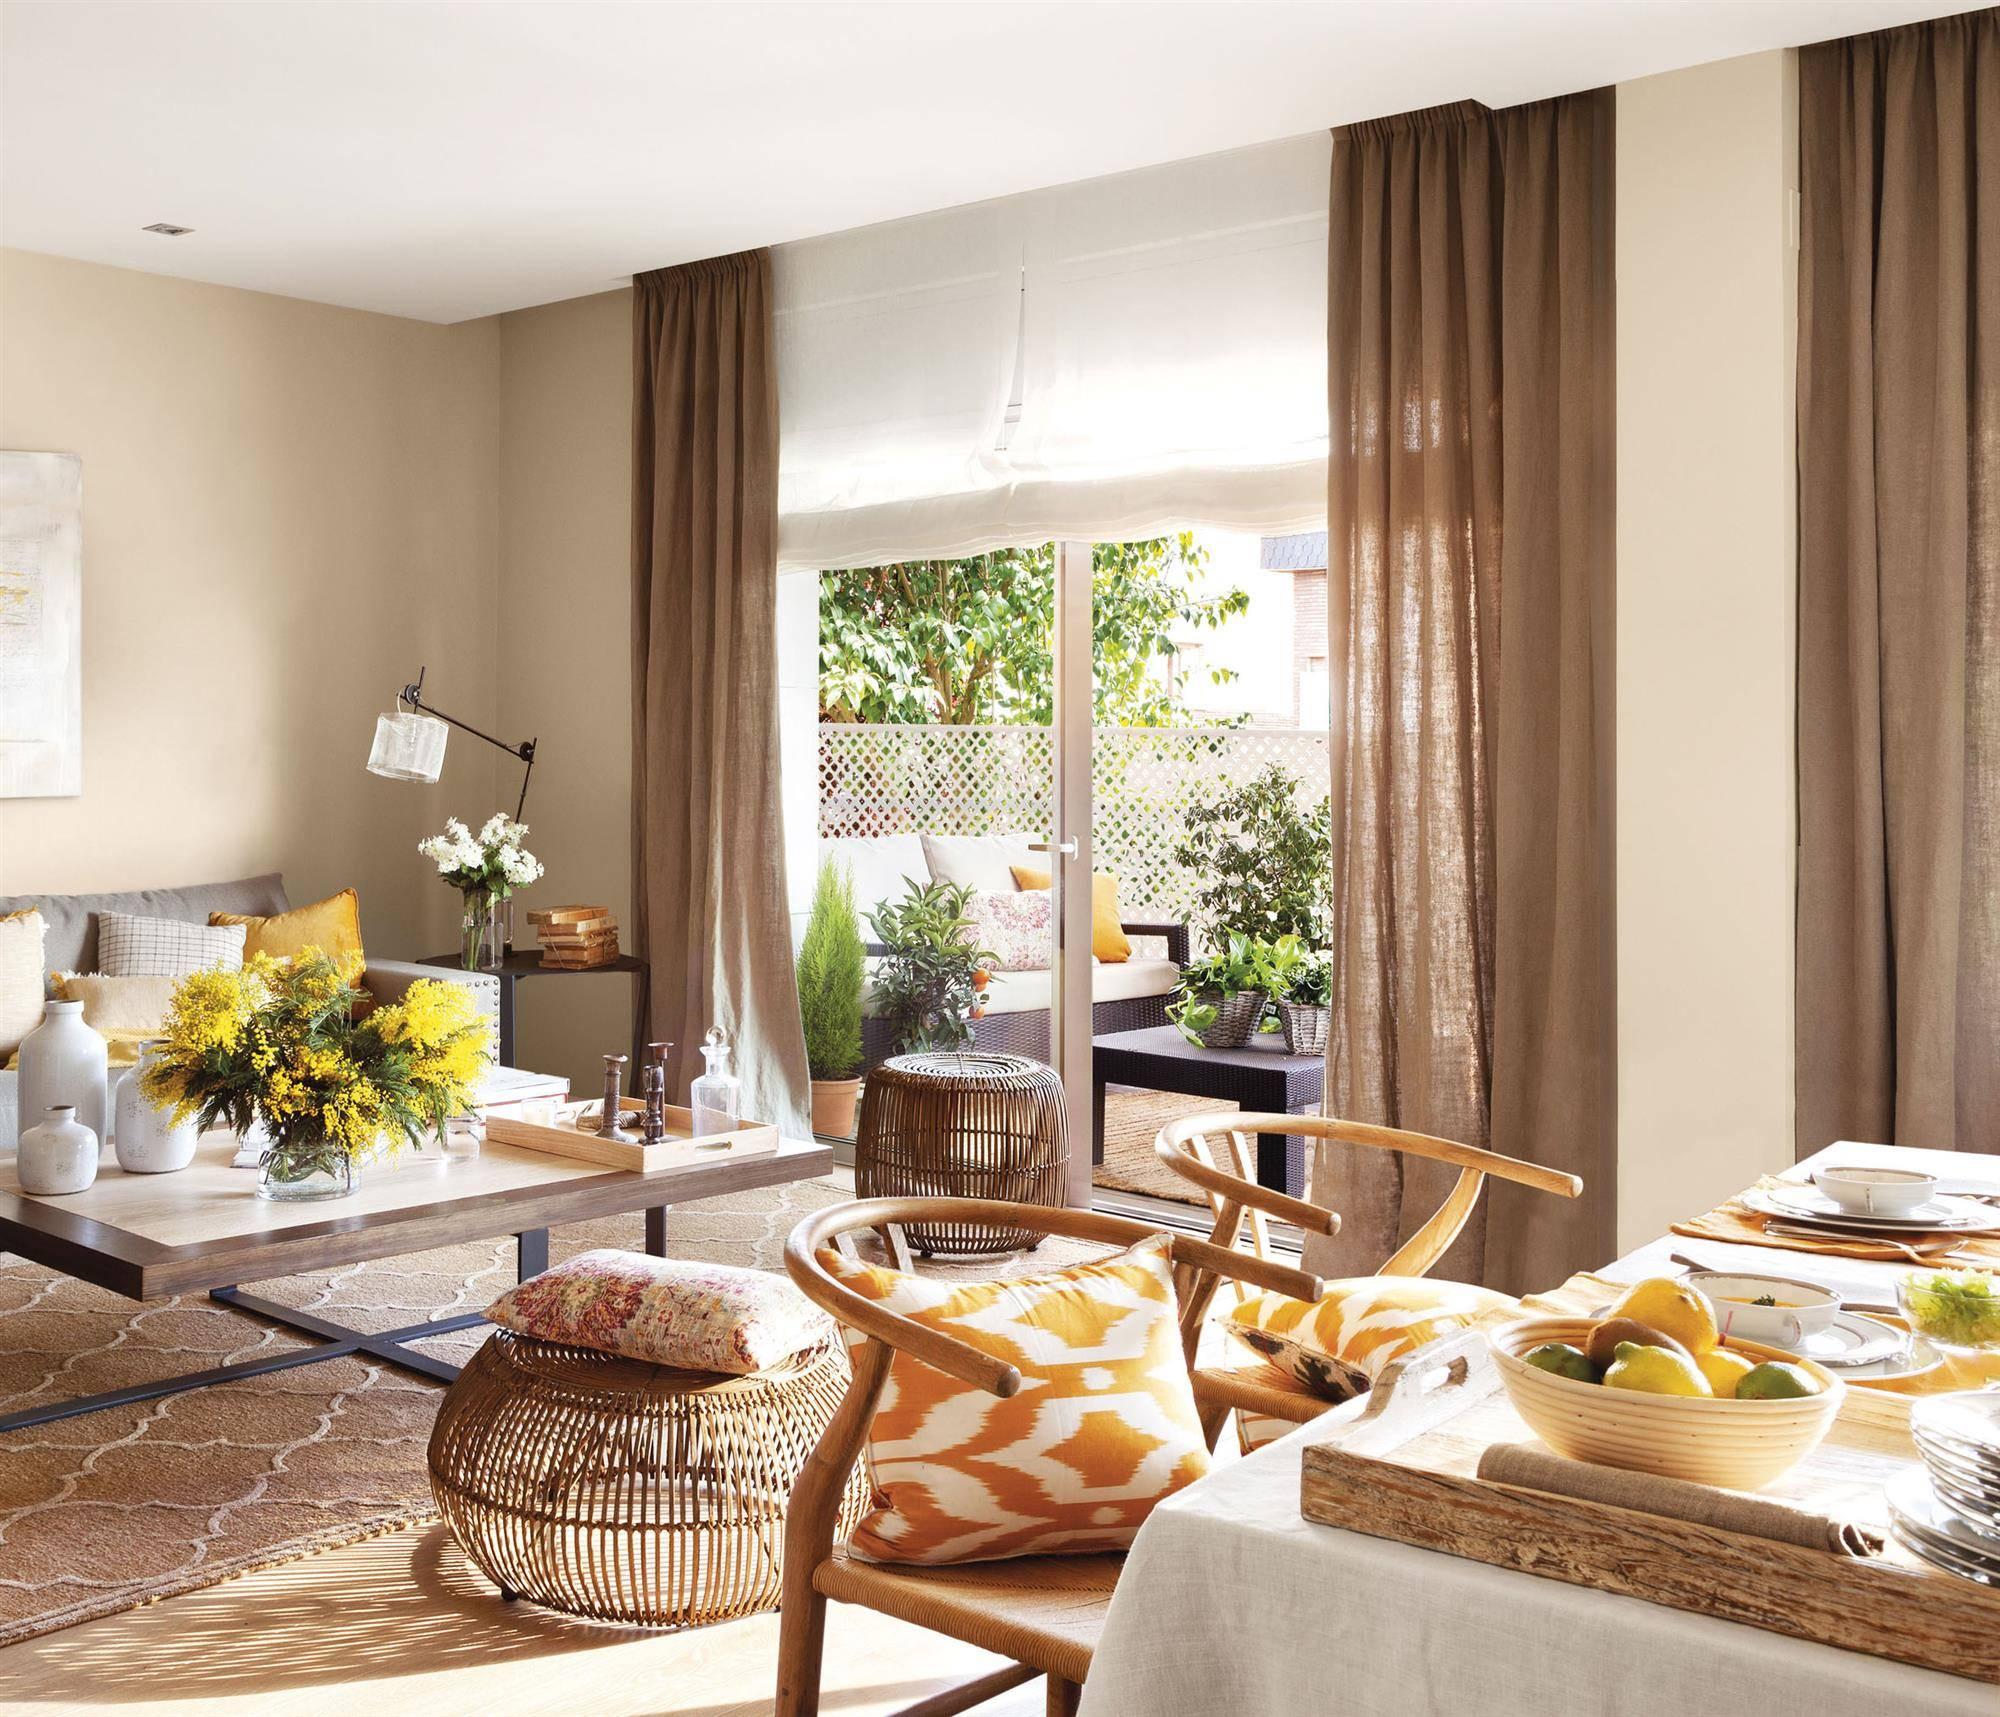 Cortinas : Cortinas para tu salón o dormitorio (telas e ideas) - ElMue